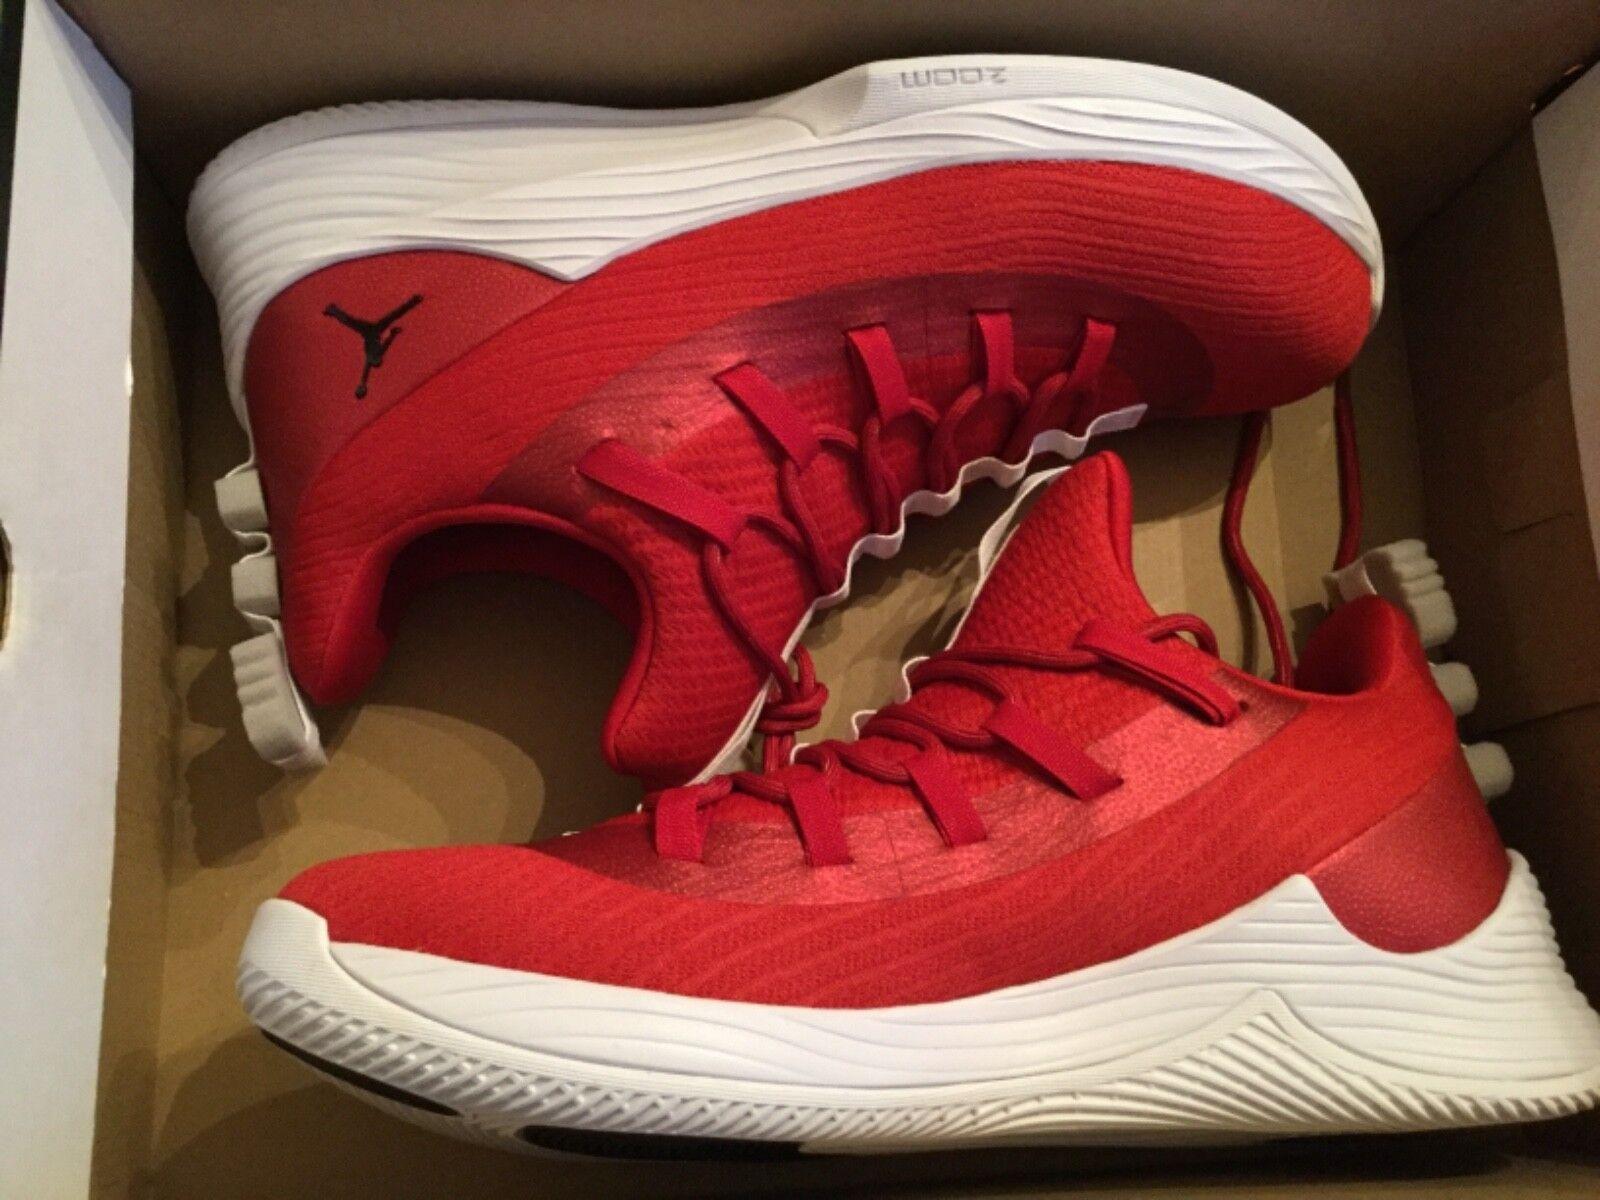 New Men's Nike Jordan Ultra Fly  2 Low shoes sneakers AH8110-601 Sz 10.5 gym red